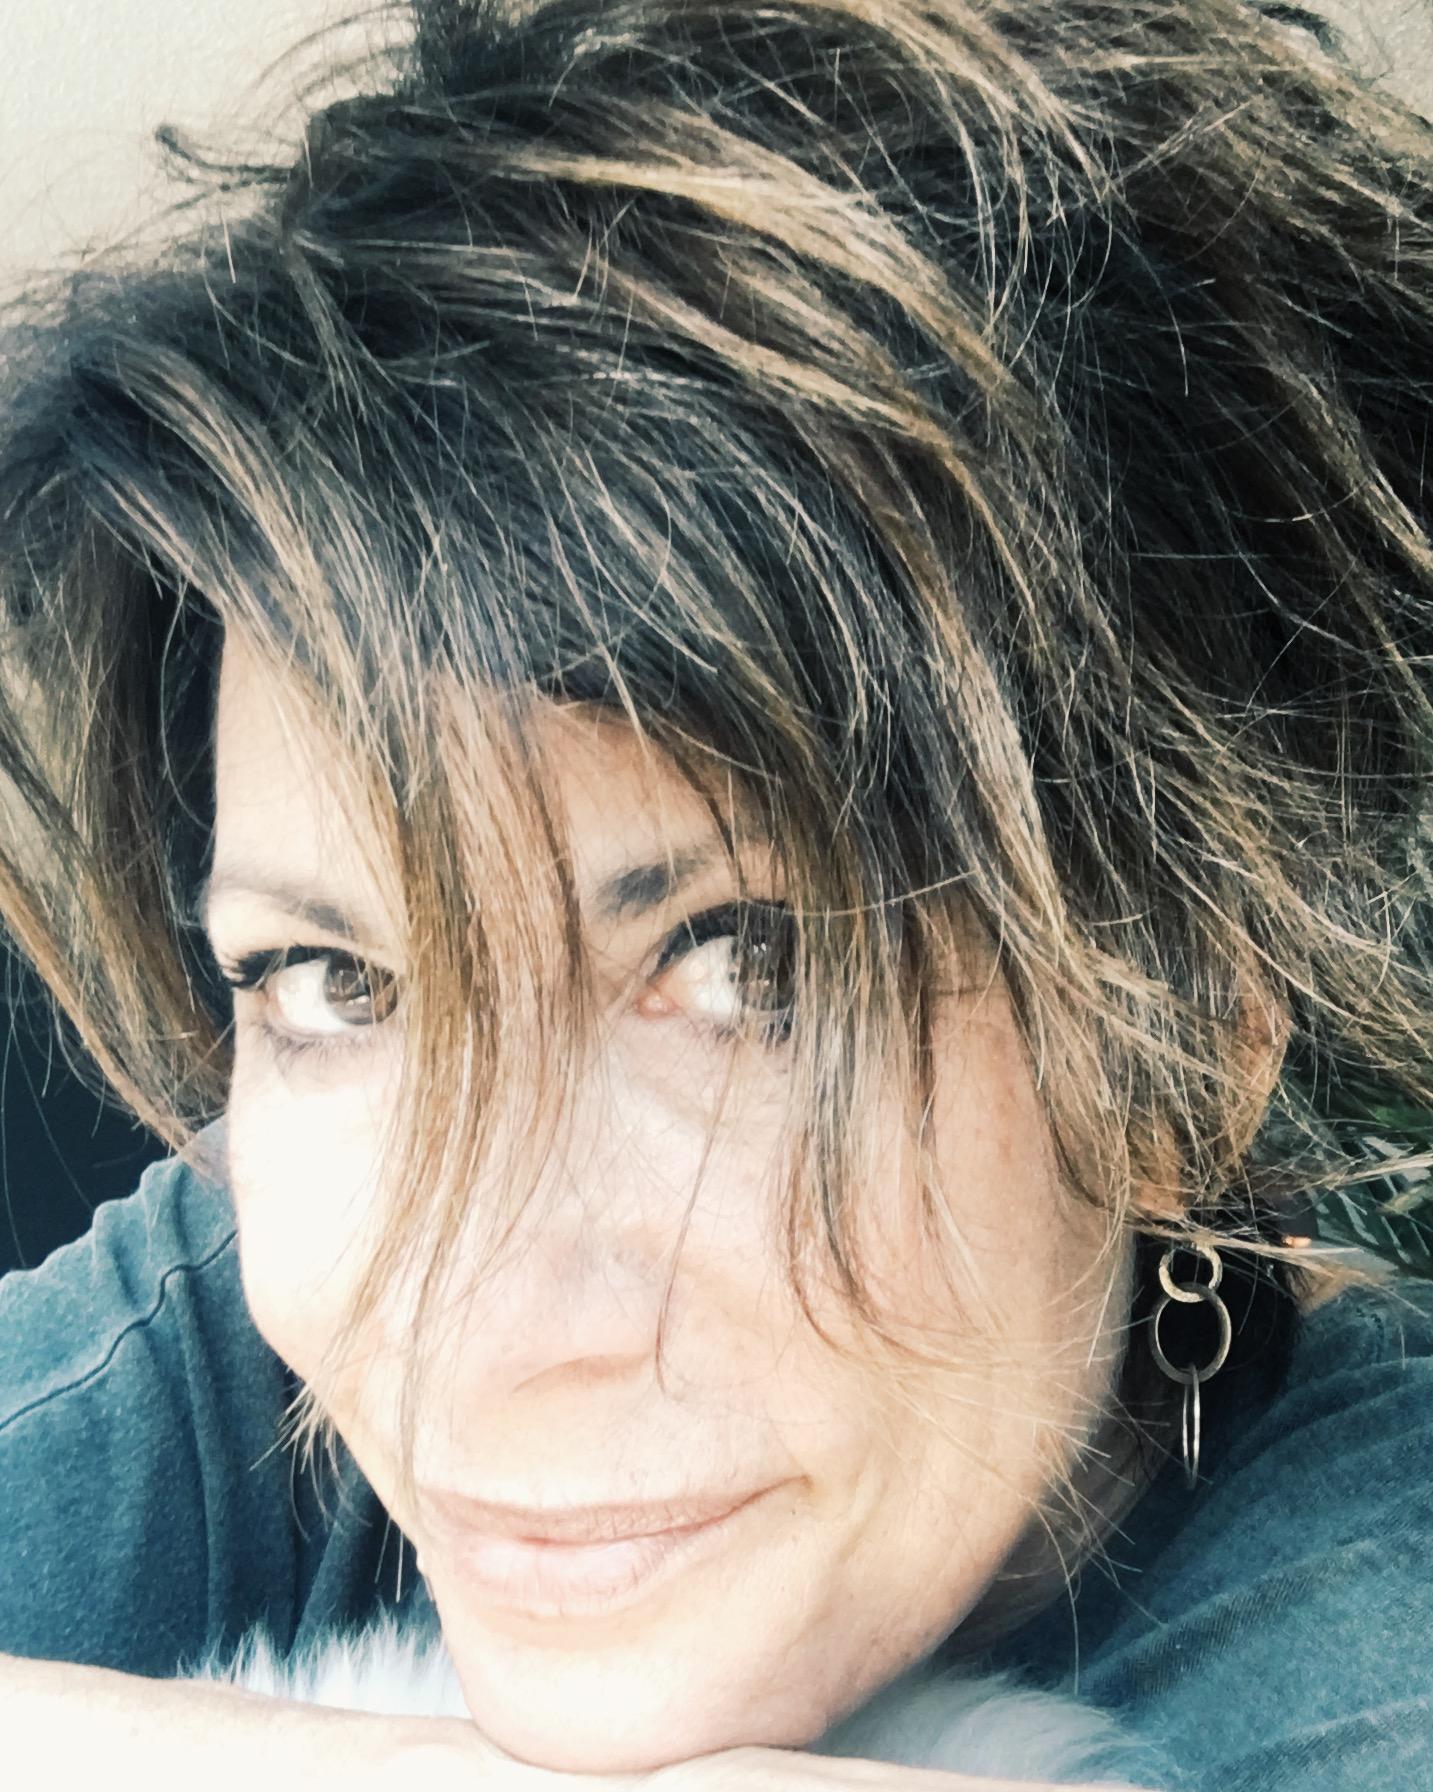 deb with wild hair.JPG